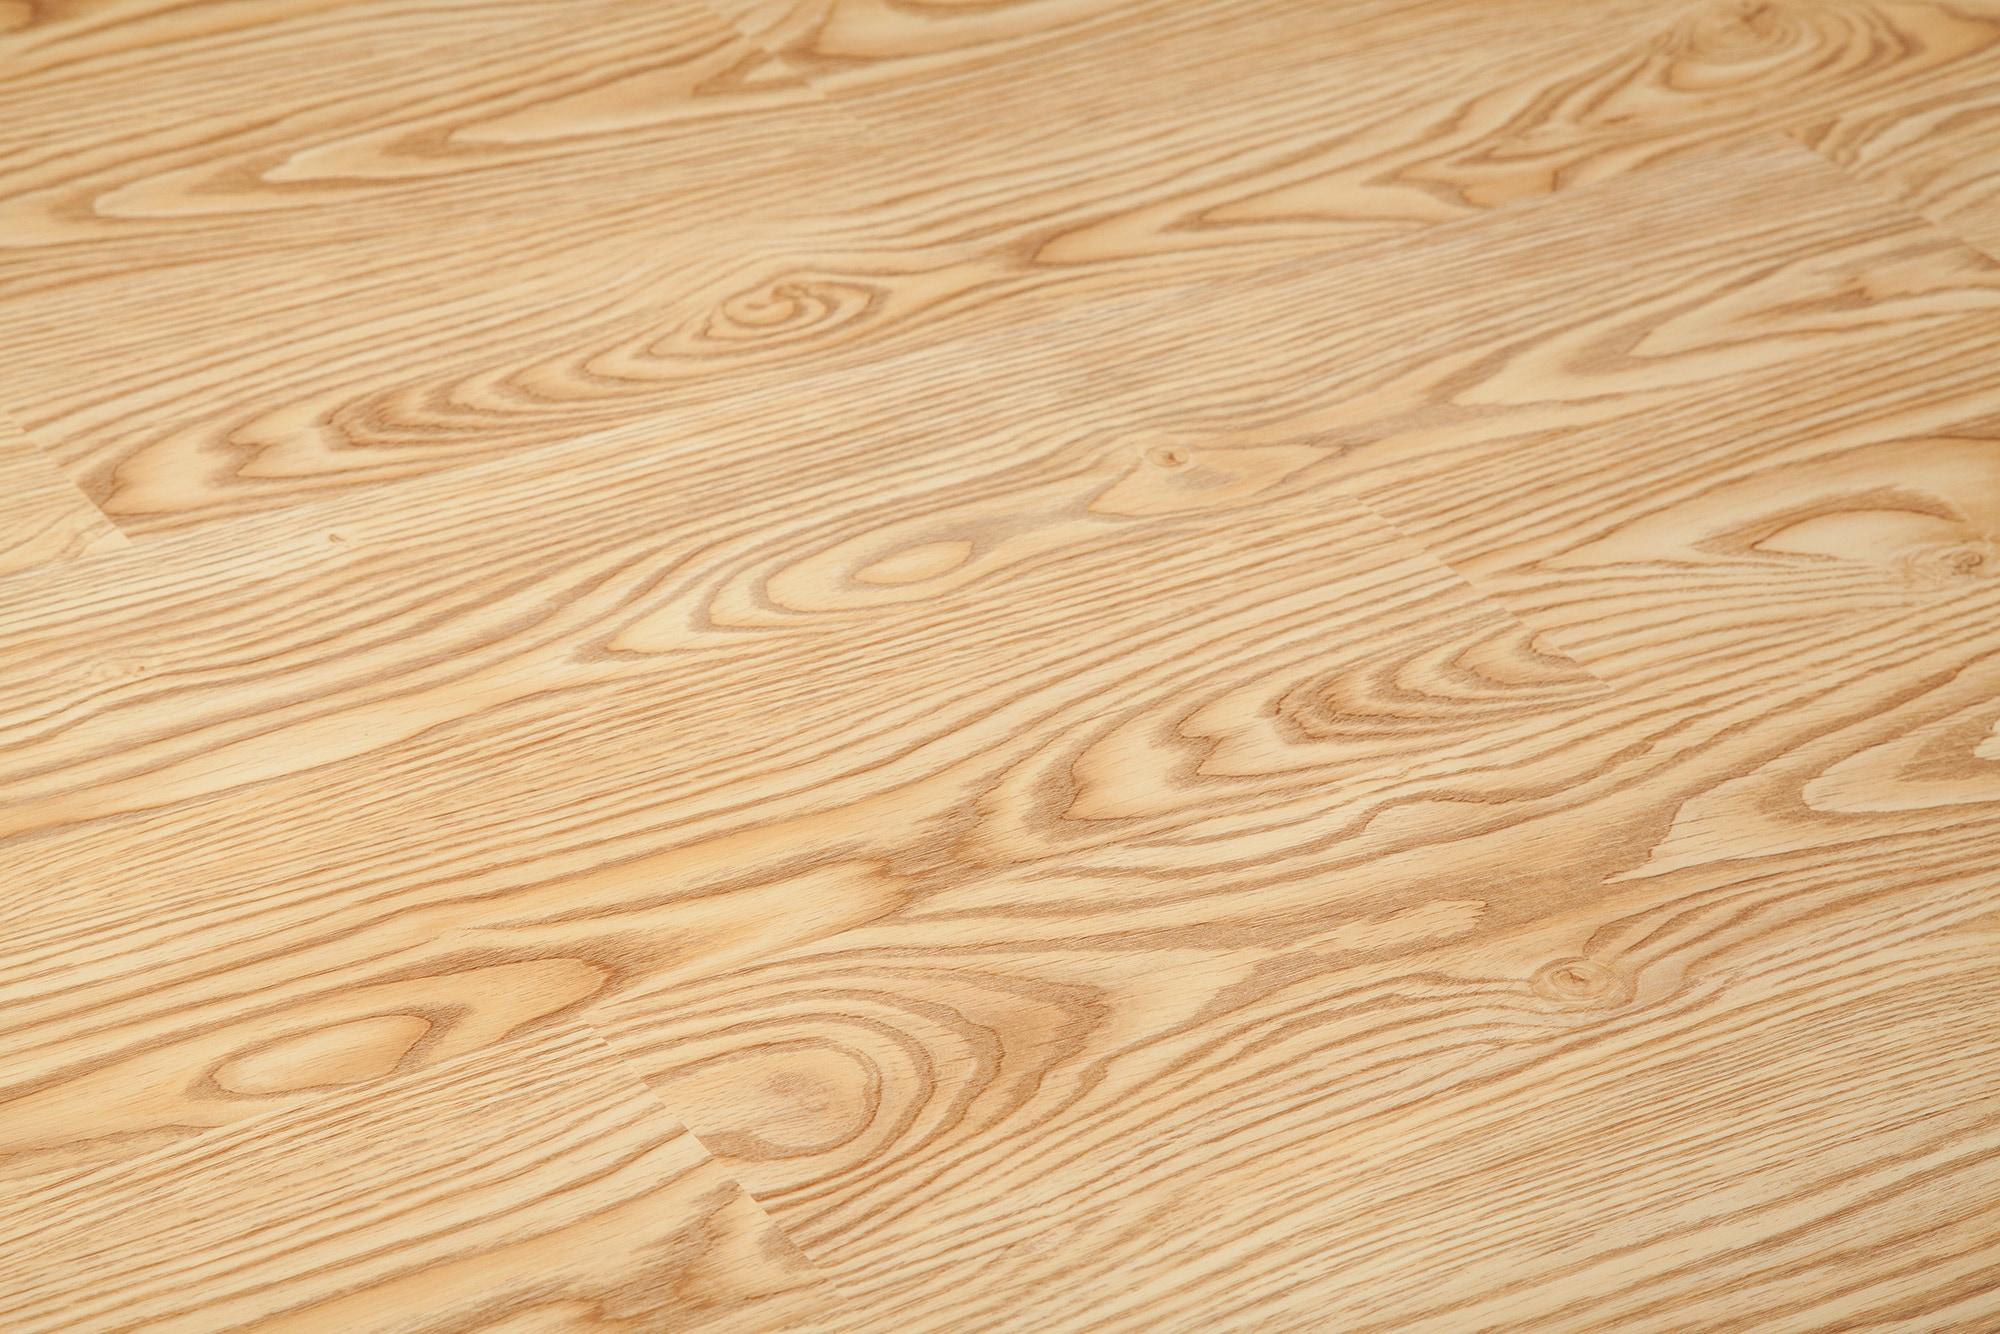 Vesdura Vinyl Planks - 4.2mm PVC Click Lock - Wood Collection Honey ...